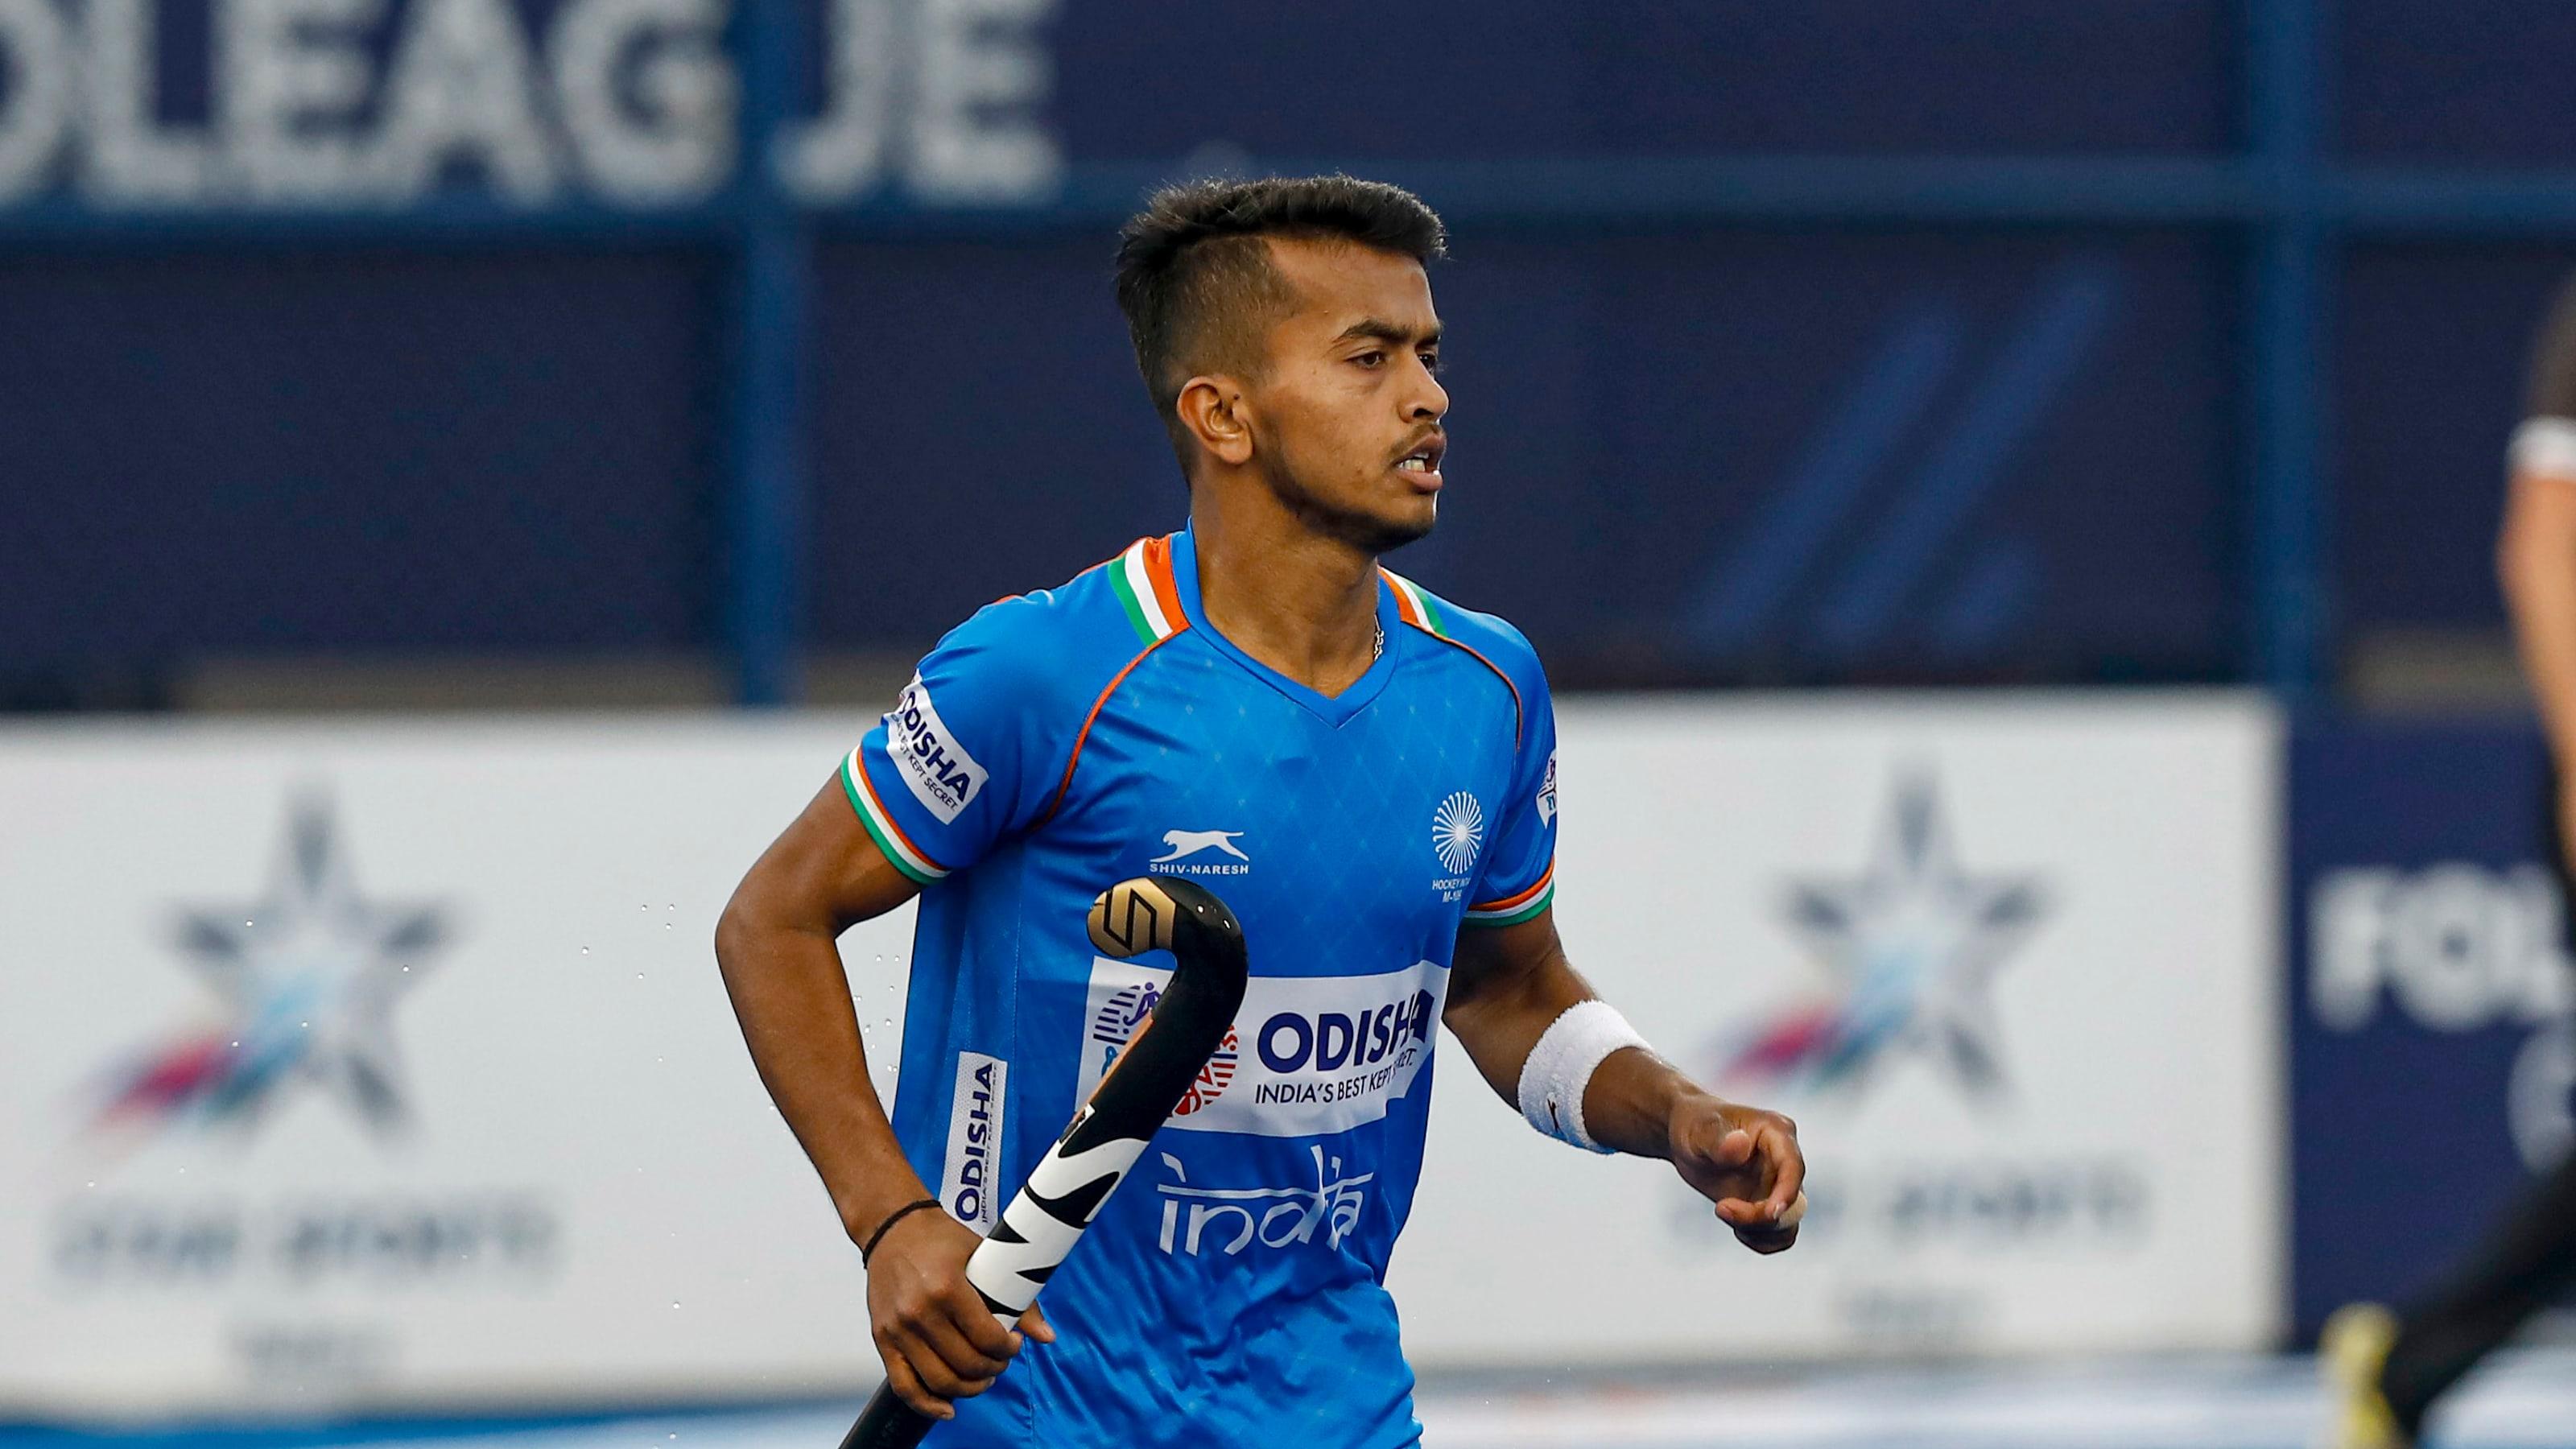 Indian hockey midfielder Vivek Sagar Prasad is FIH Rising Star of the Year